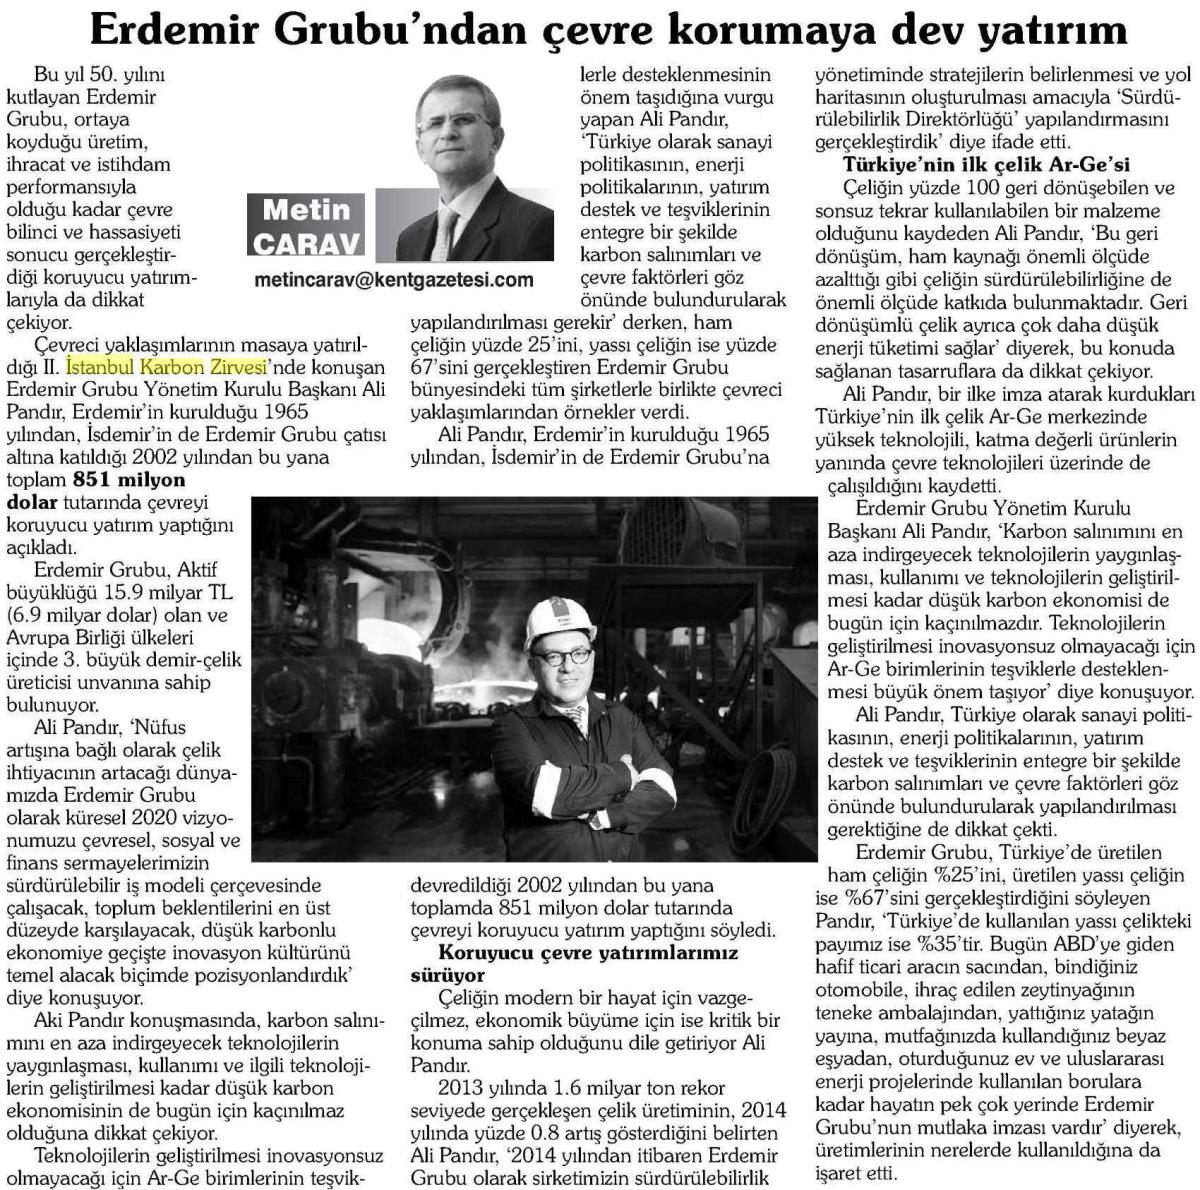 Kent Gazetesi Bursa 05.04.2015